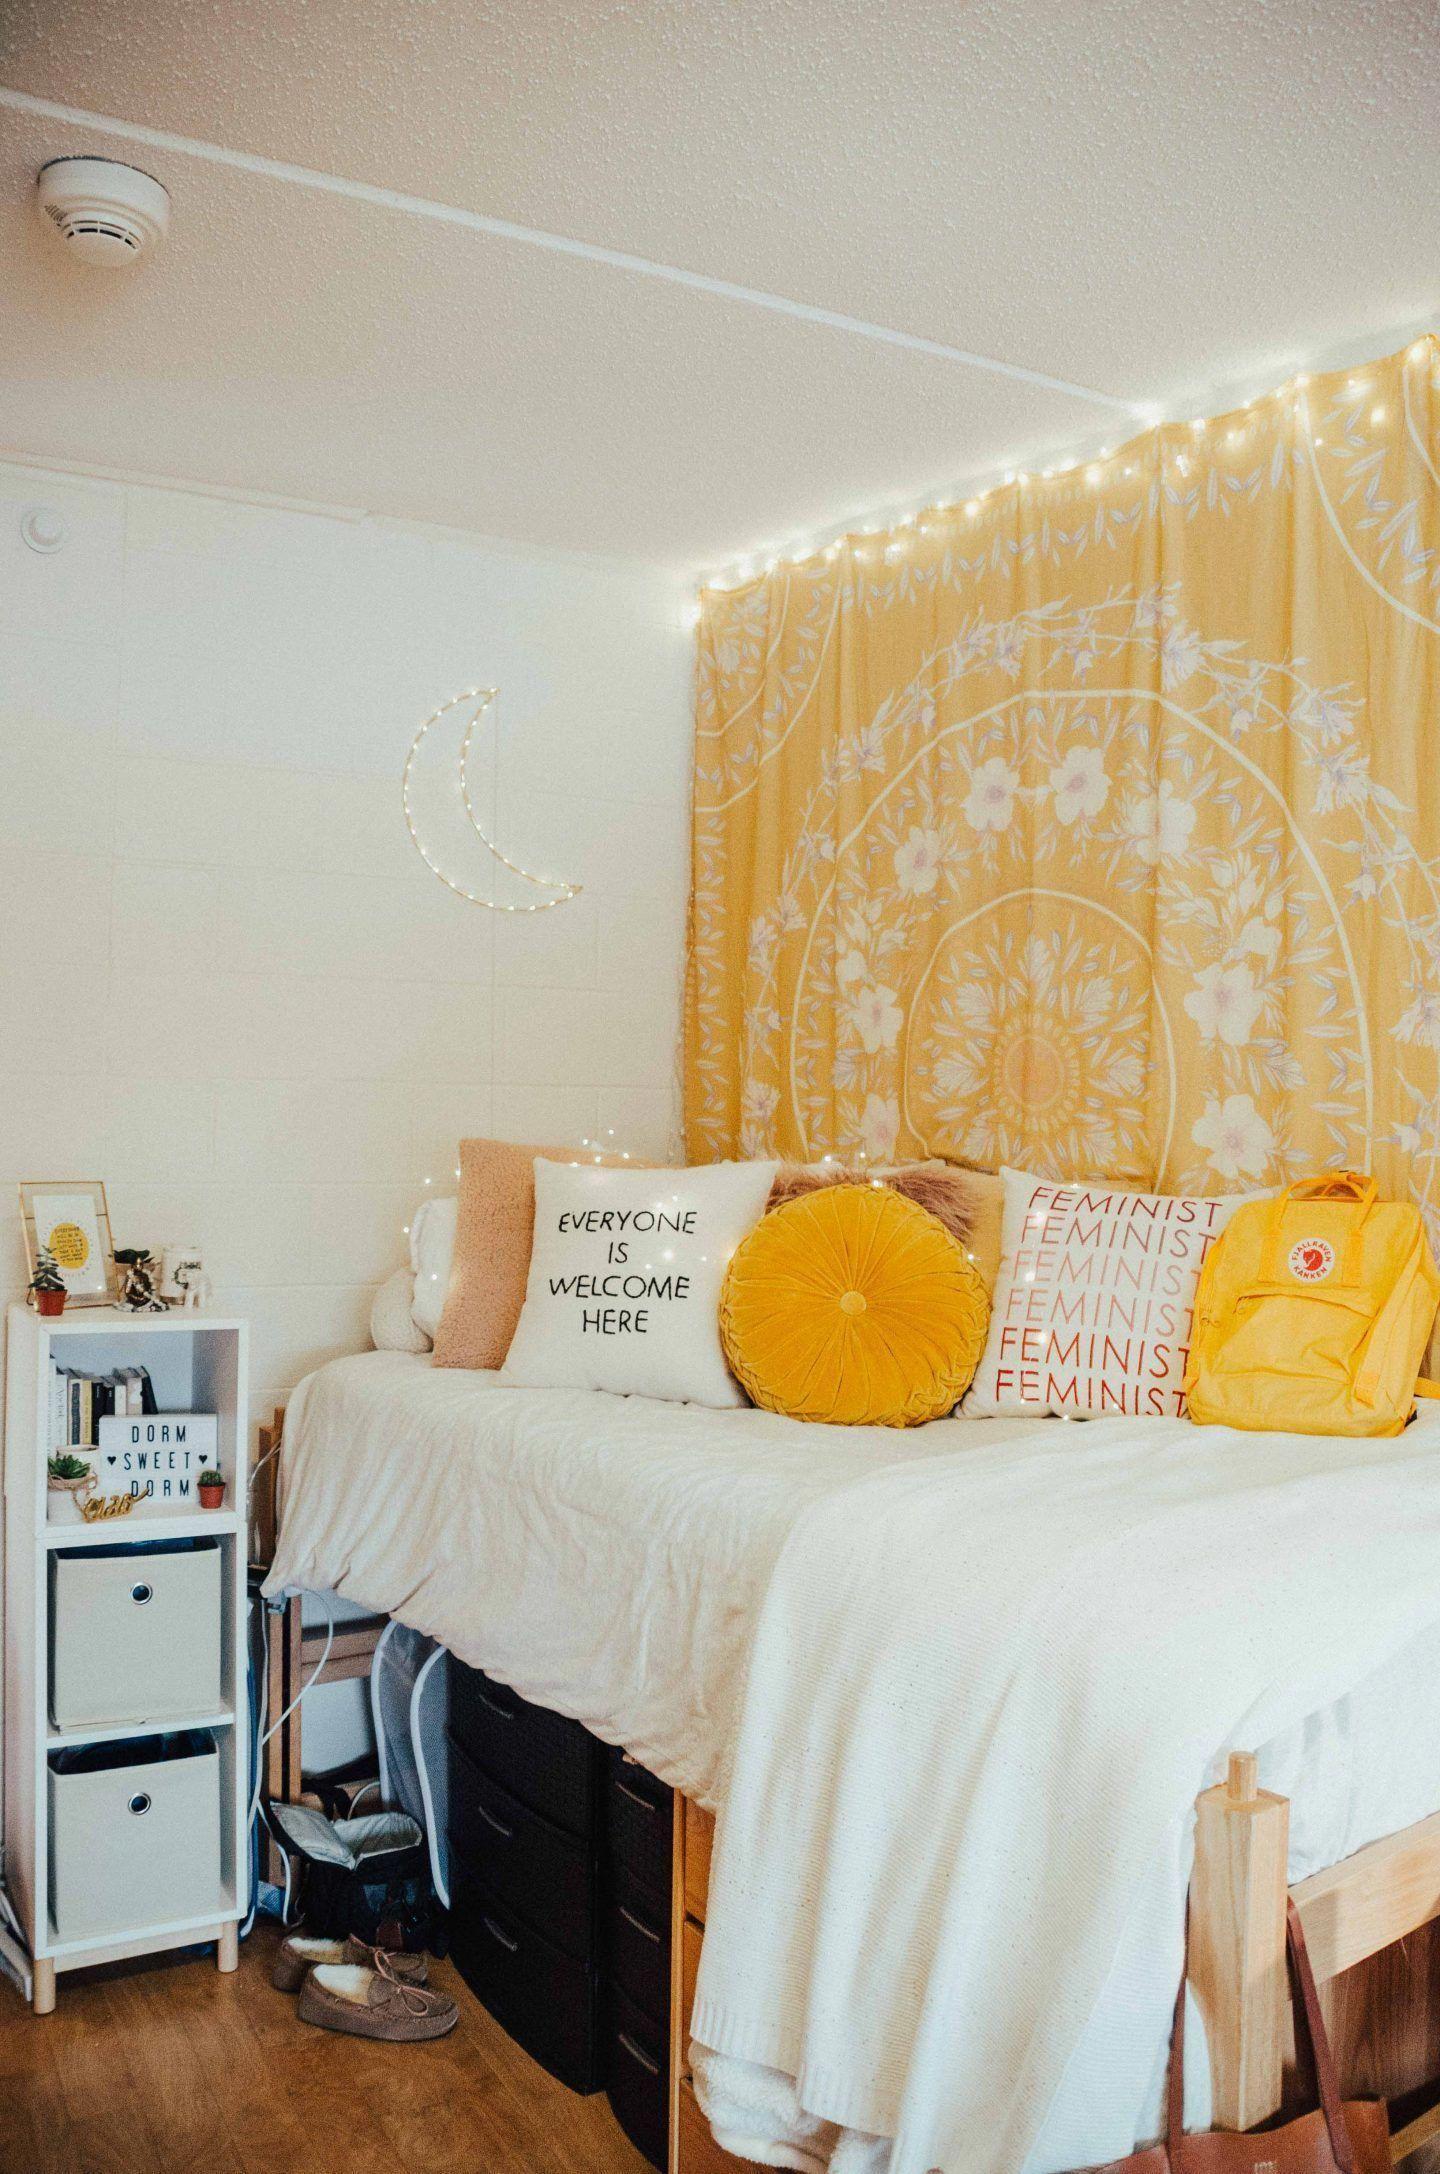 Categorysaving Money Saleprice 49 Dorm Room Inspiration Dorm Room Designs Yellow Bedroom Decor